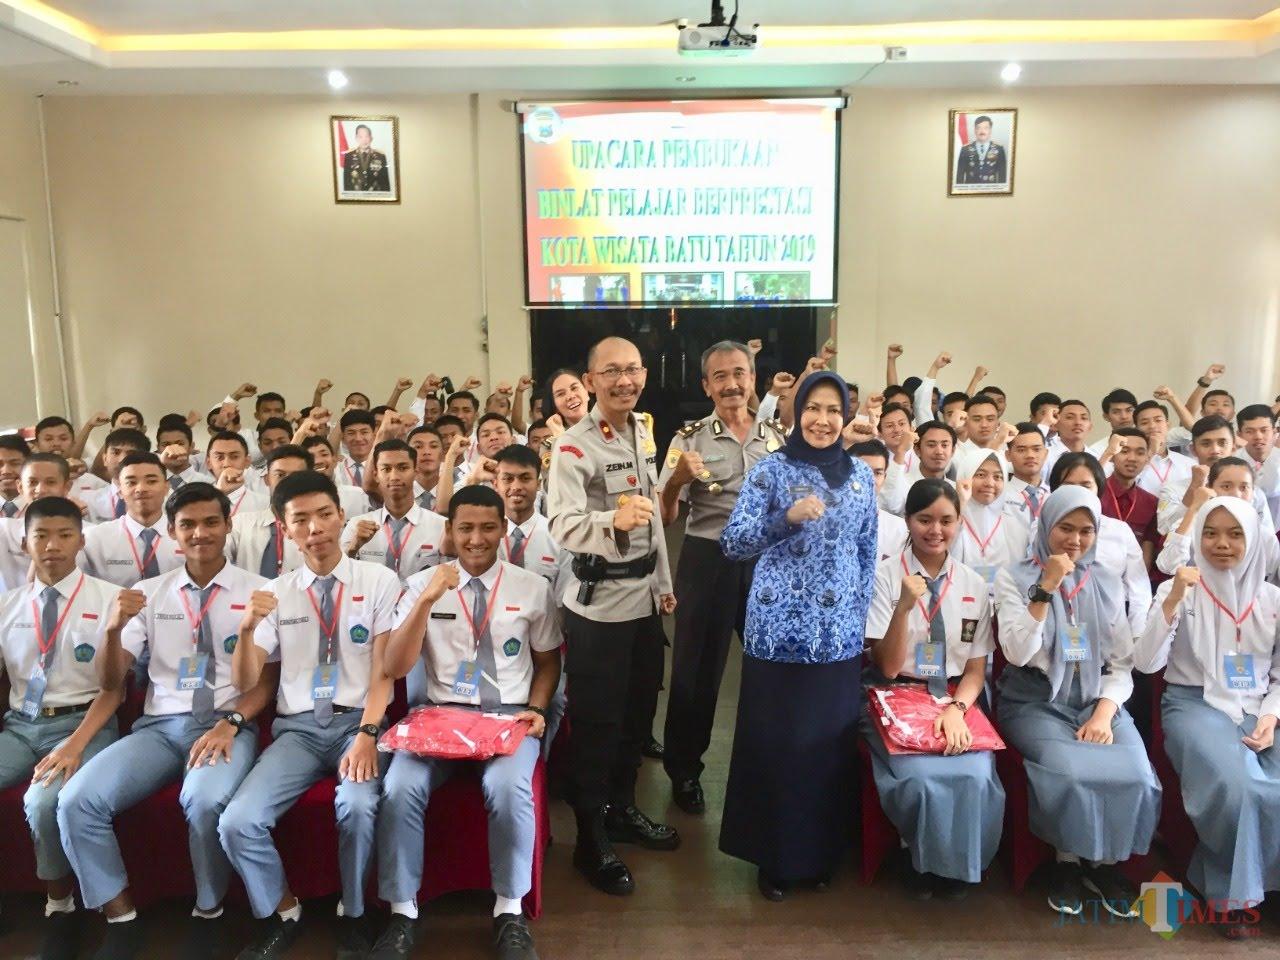 Pelajar SMA/SMK saat bersama Wakapolres Batu Kompol Zein Mawardi bersama Wali Kota Batu Dewanti Rumpoko beberapa saat lalu. (Foto: Irsya Richa/MalangTIMES)